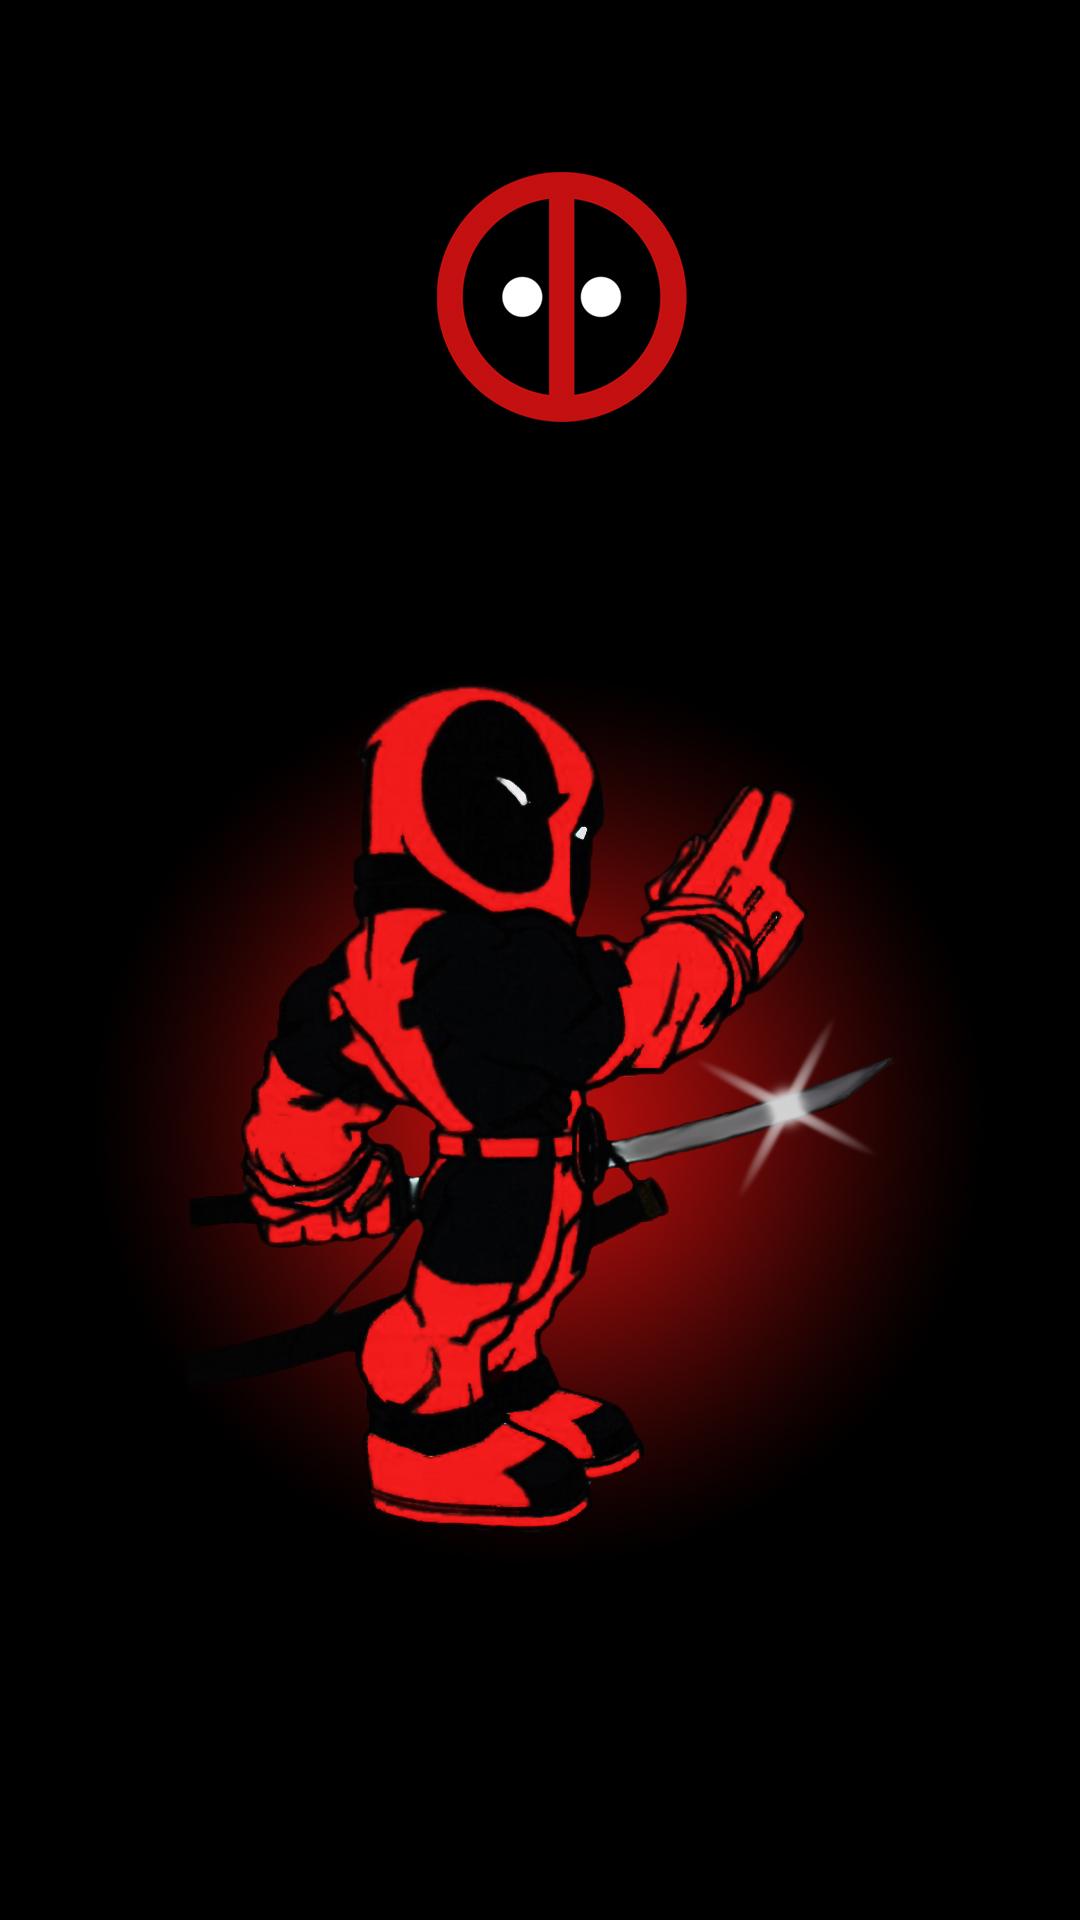 Simple Wallpaper Logo Deadpool - 3eXvA8  Photograph_472182.jpg